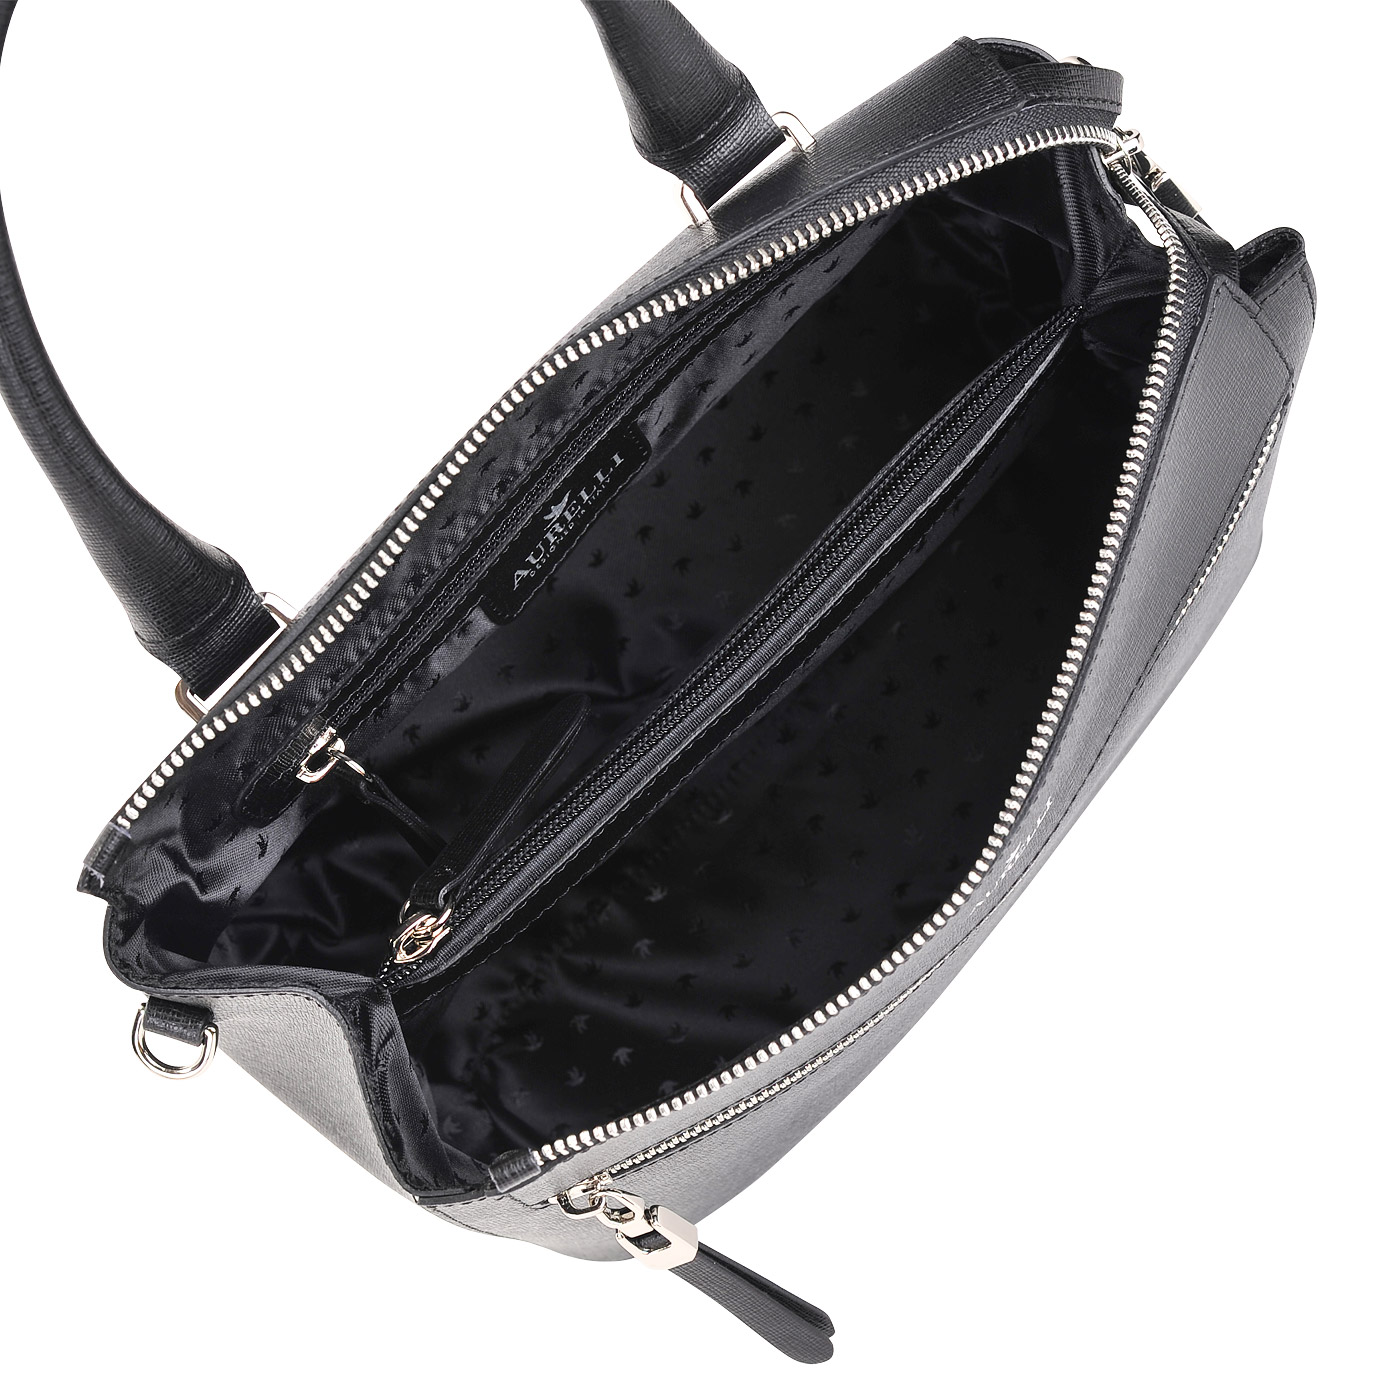 3fd6153598ea Женская кожаная сумка Aurelli 16W0041-18S-nero - 2000557669345 ...